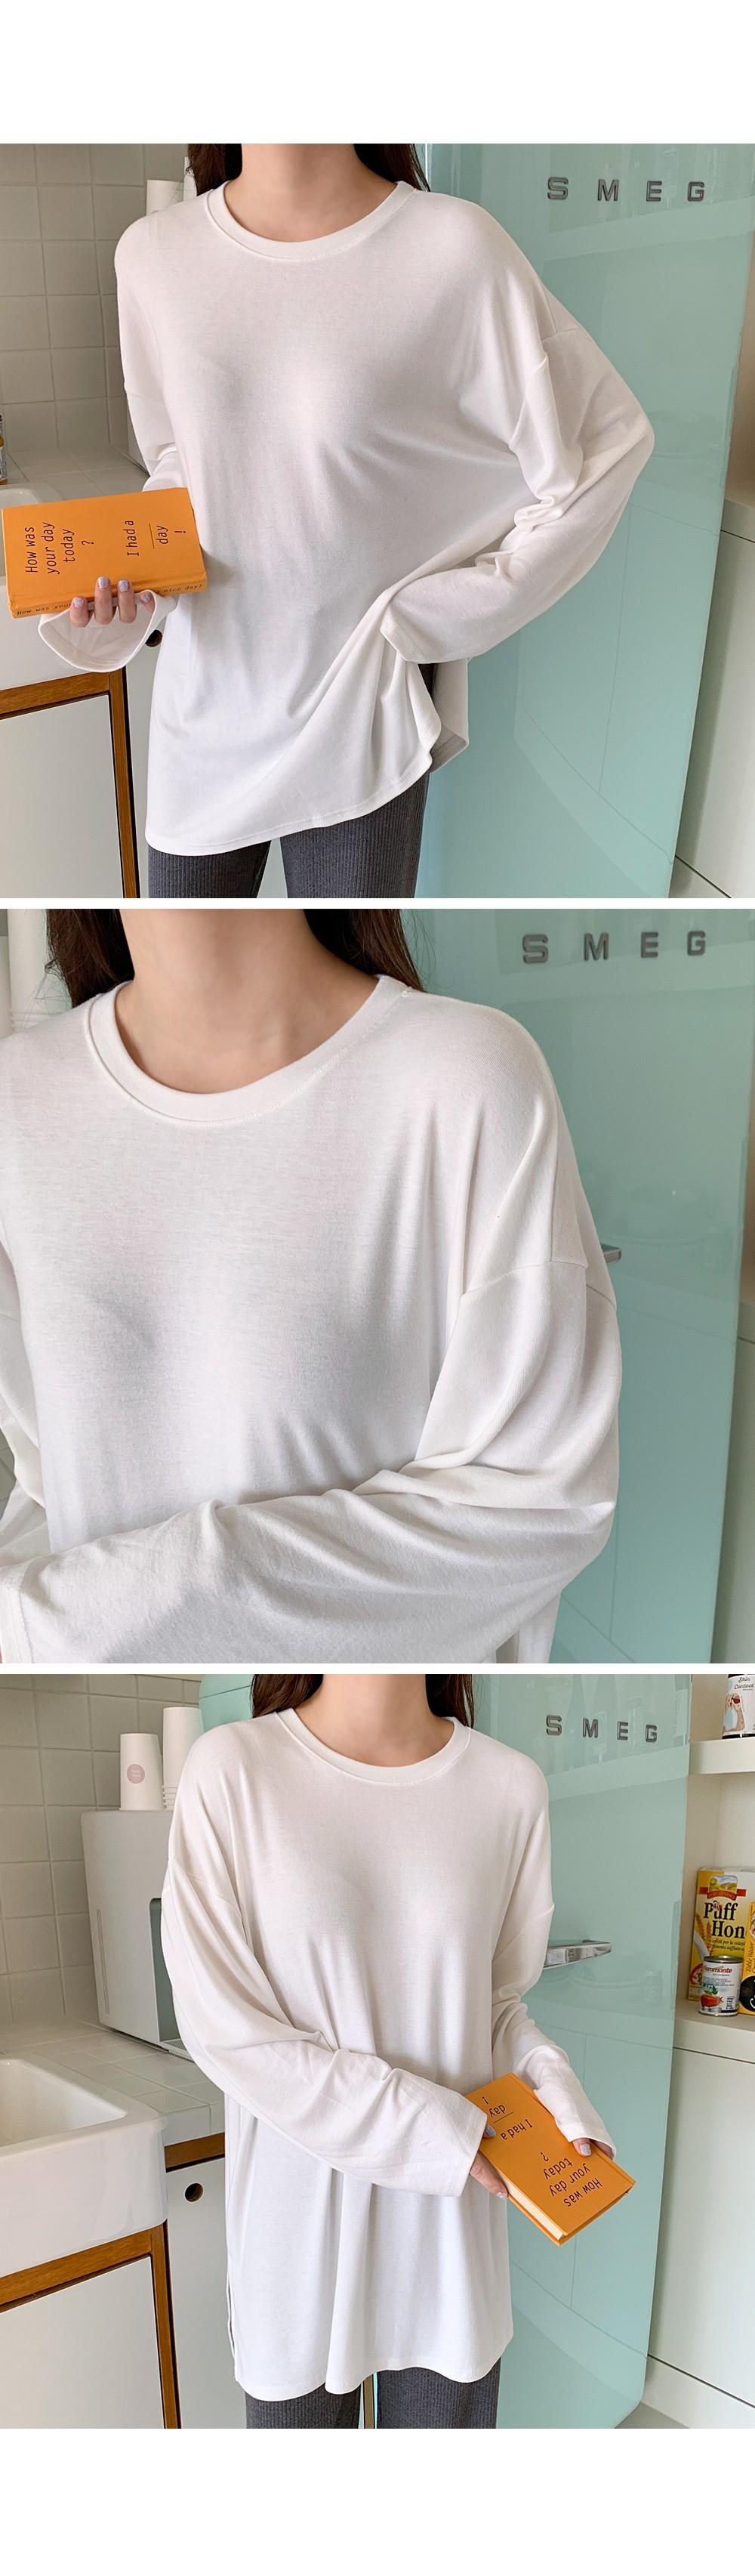 Long box, long sleeve T, good length to layer: D